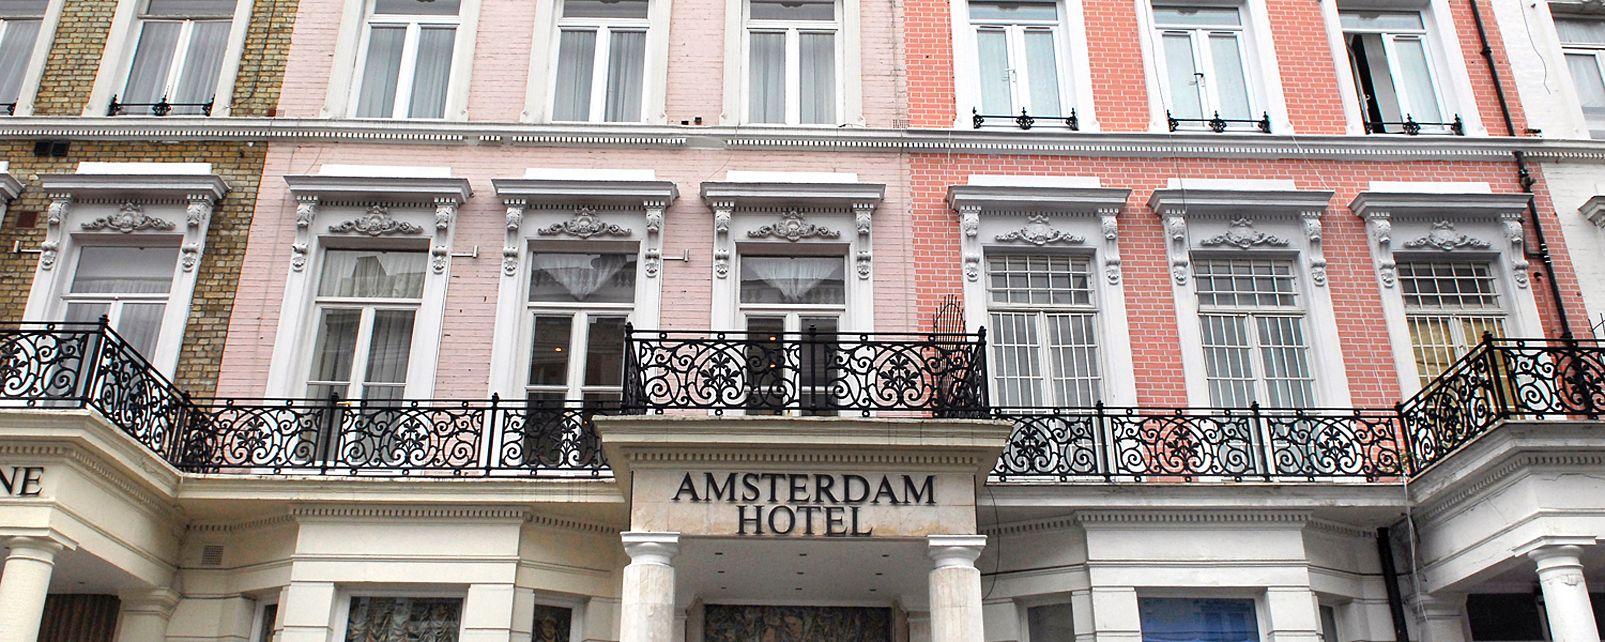 Hôtel Amsterdam Hotel London